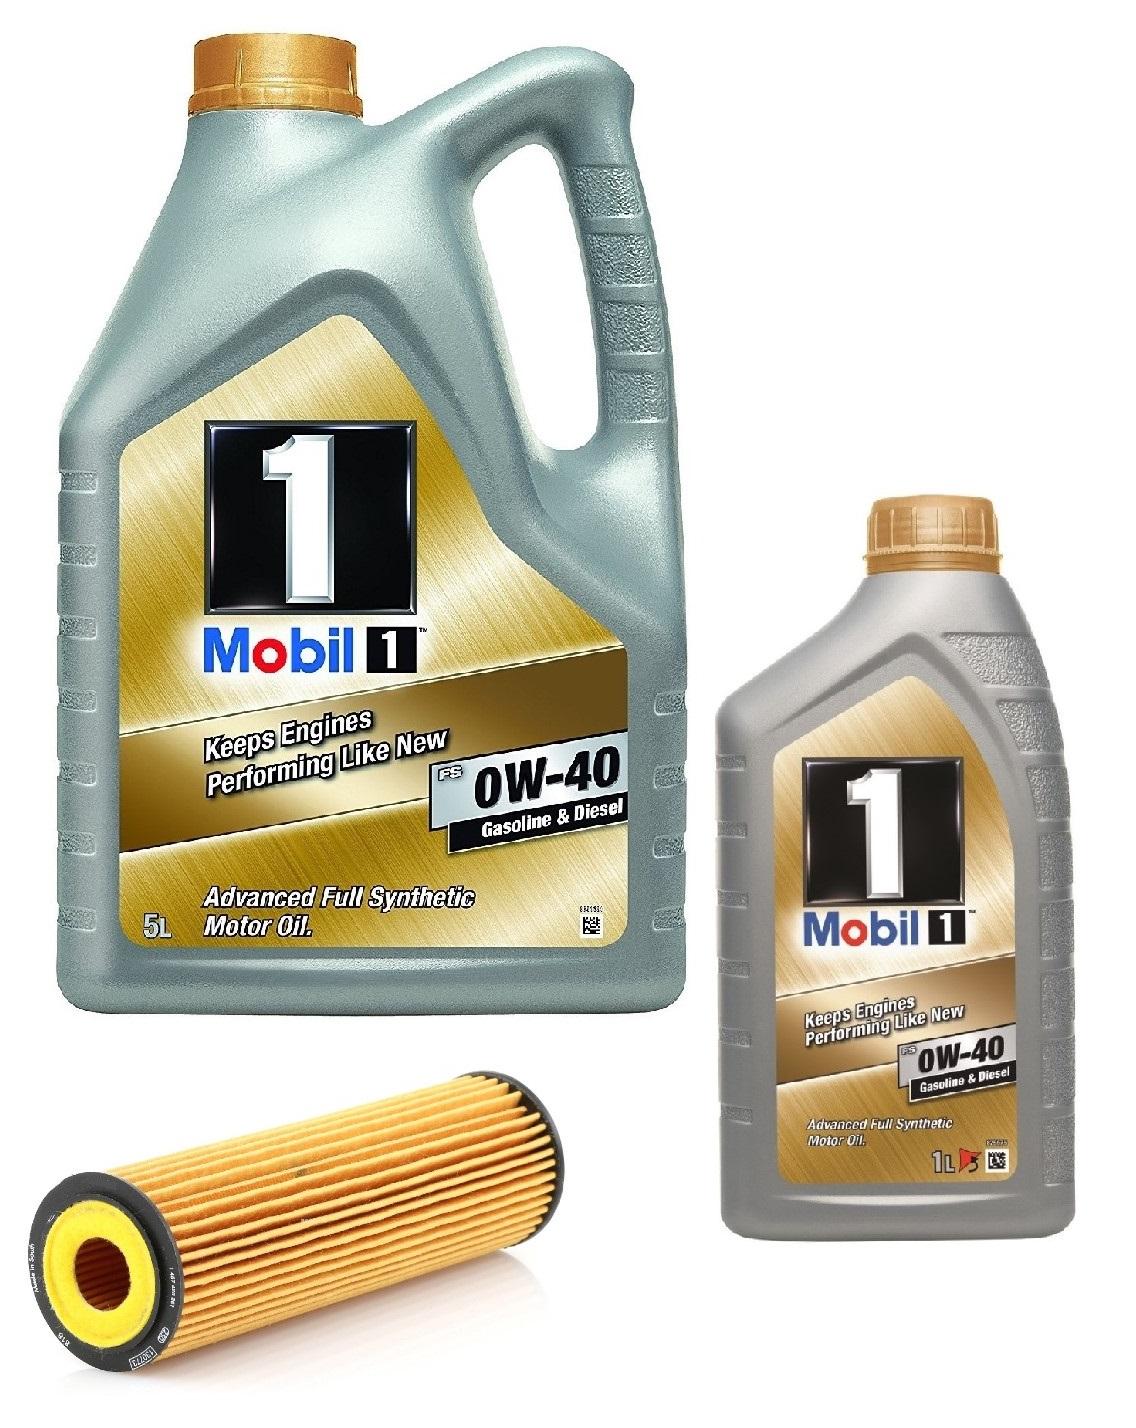 mobil 1 fs 0w40 6 litros filtro aceite fram ch9918eco. Black Bedroom Furniture Sets. Home Design Ideas